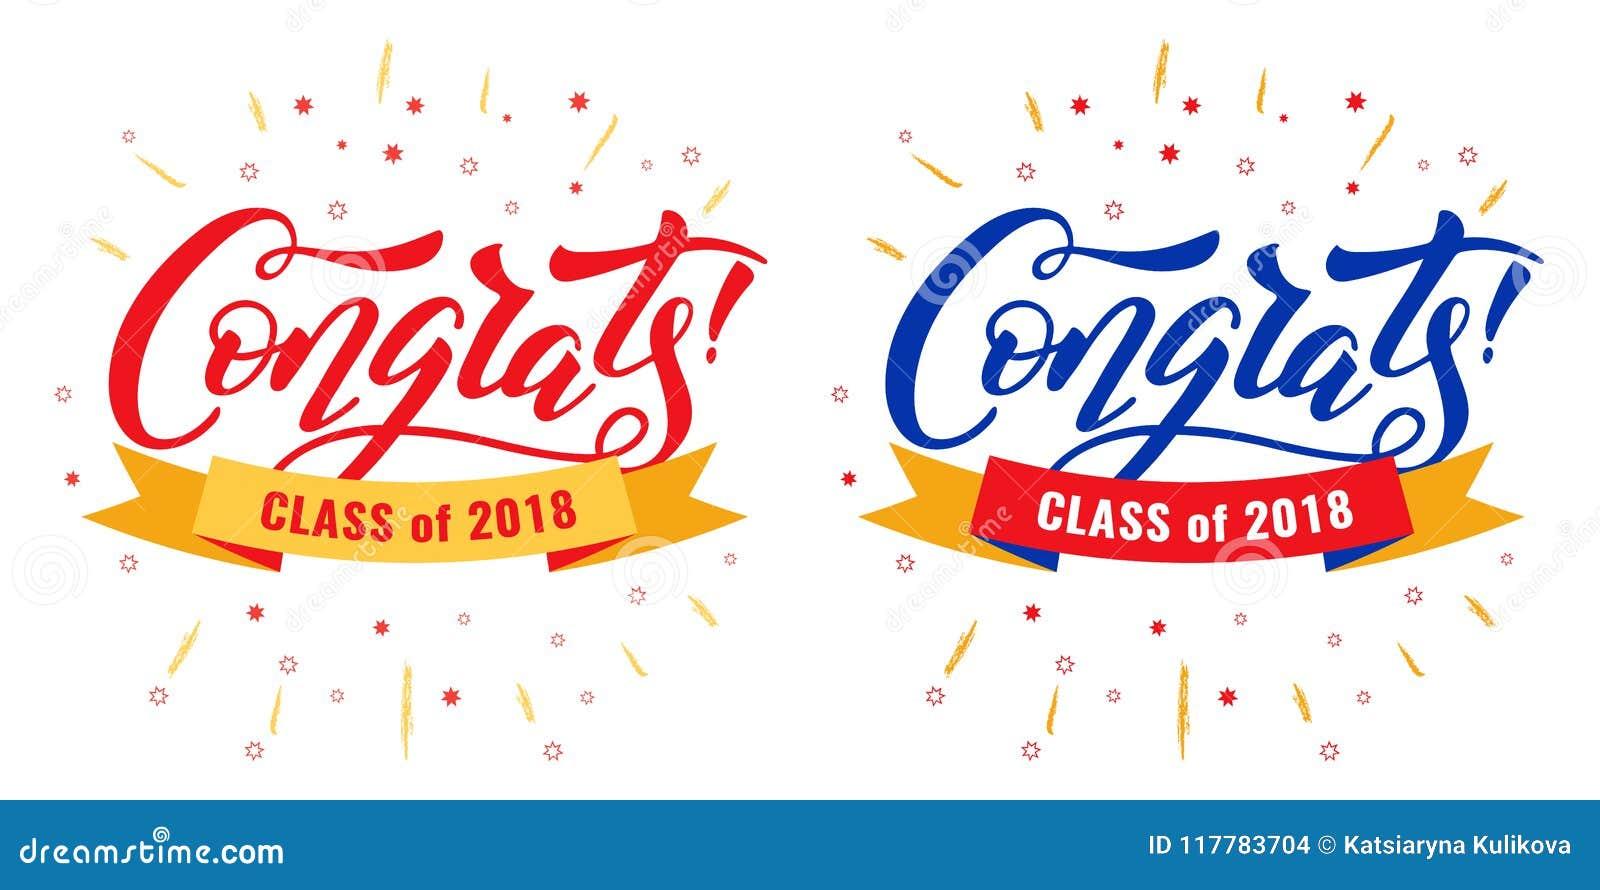 Congrats Graduates Class Stock Vector Illustration Of Greeting